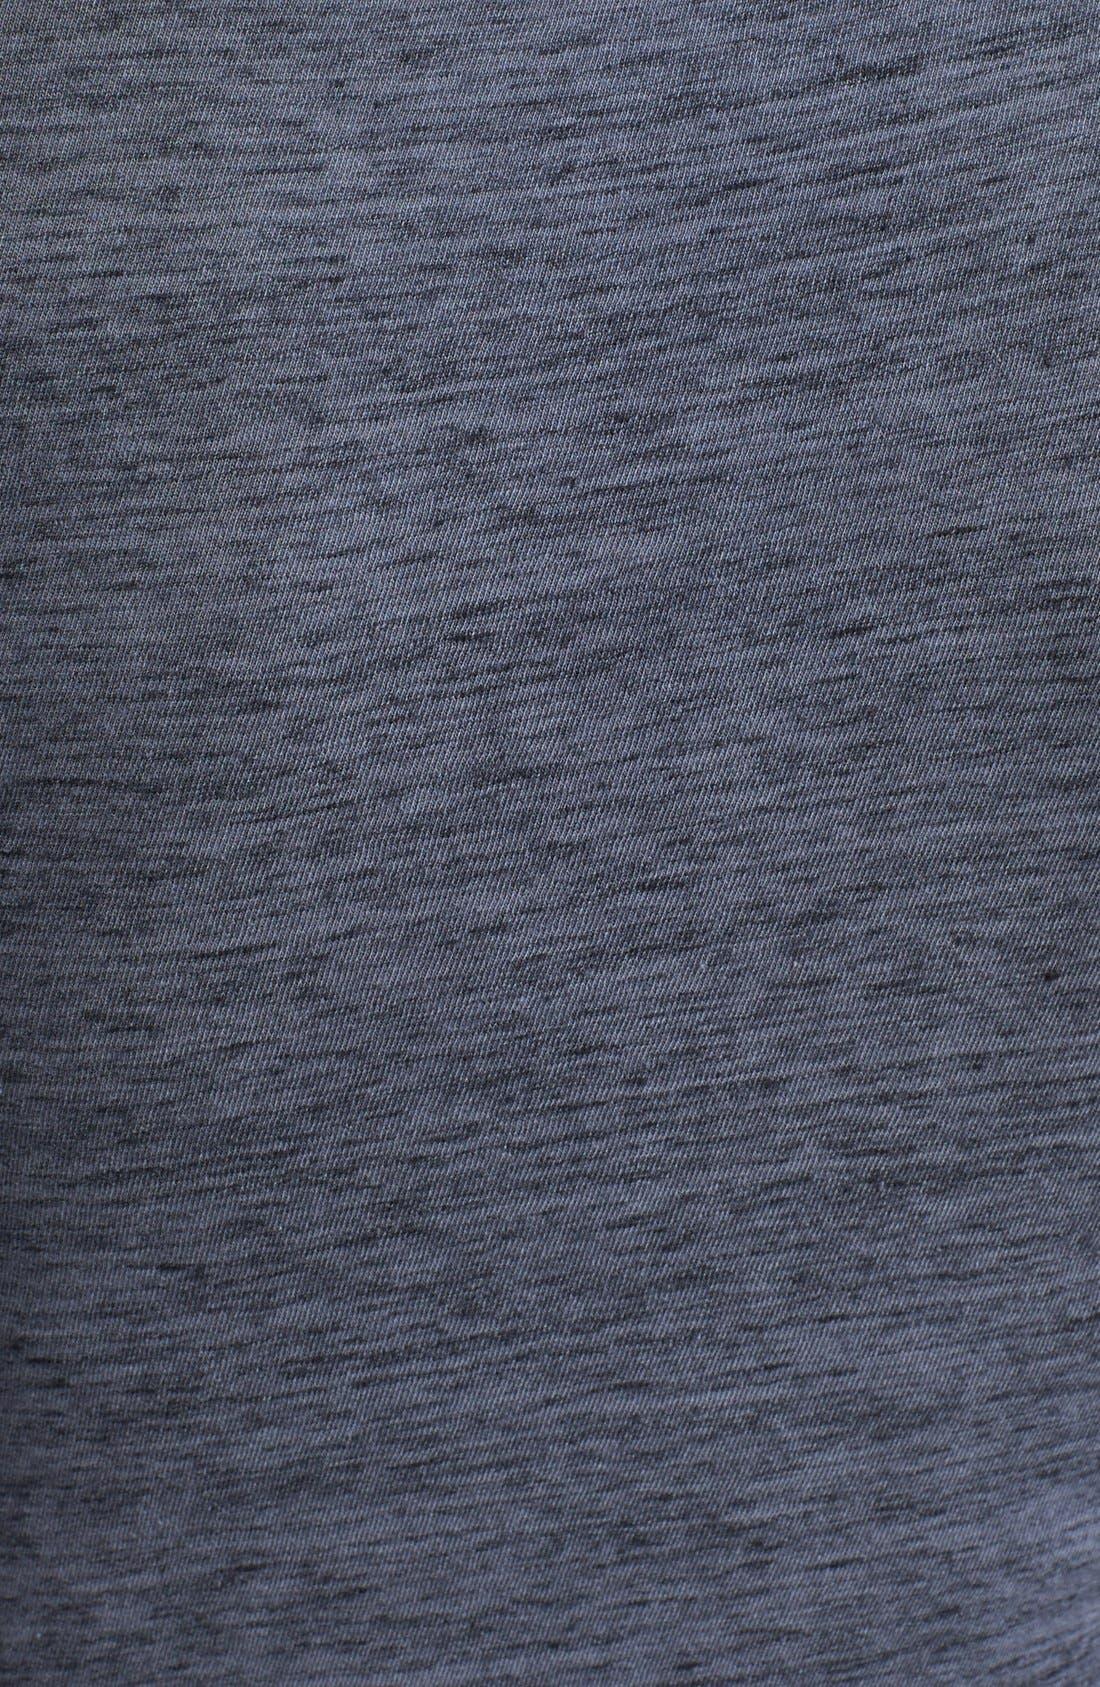 Alternate Image 3  - James Perse Jewel Neck Dress